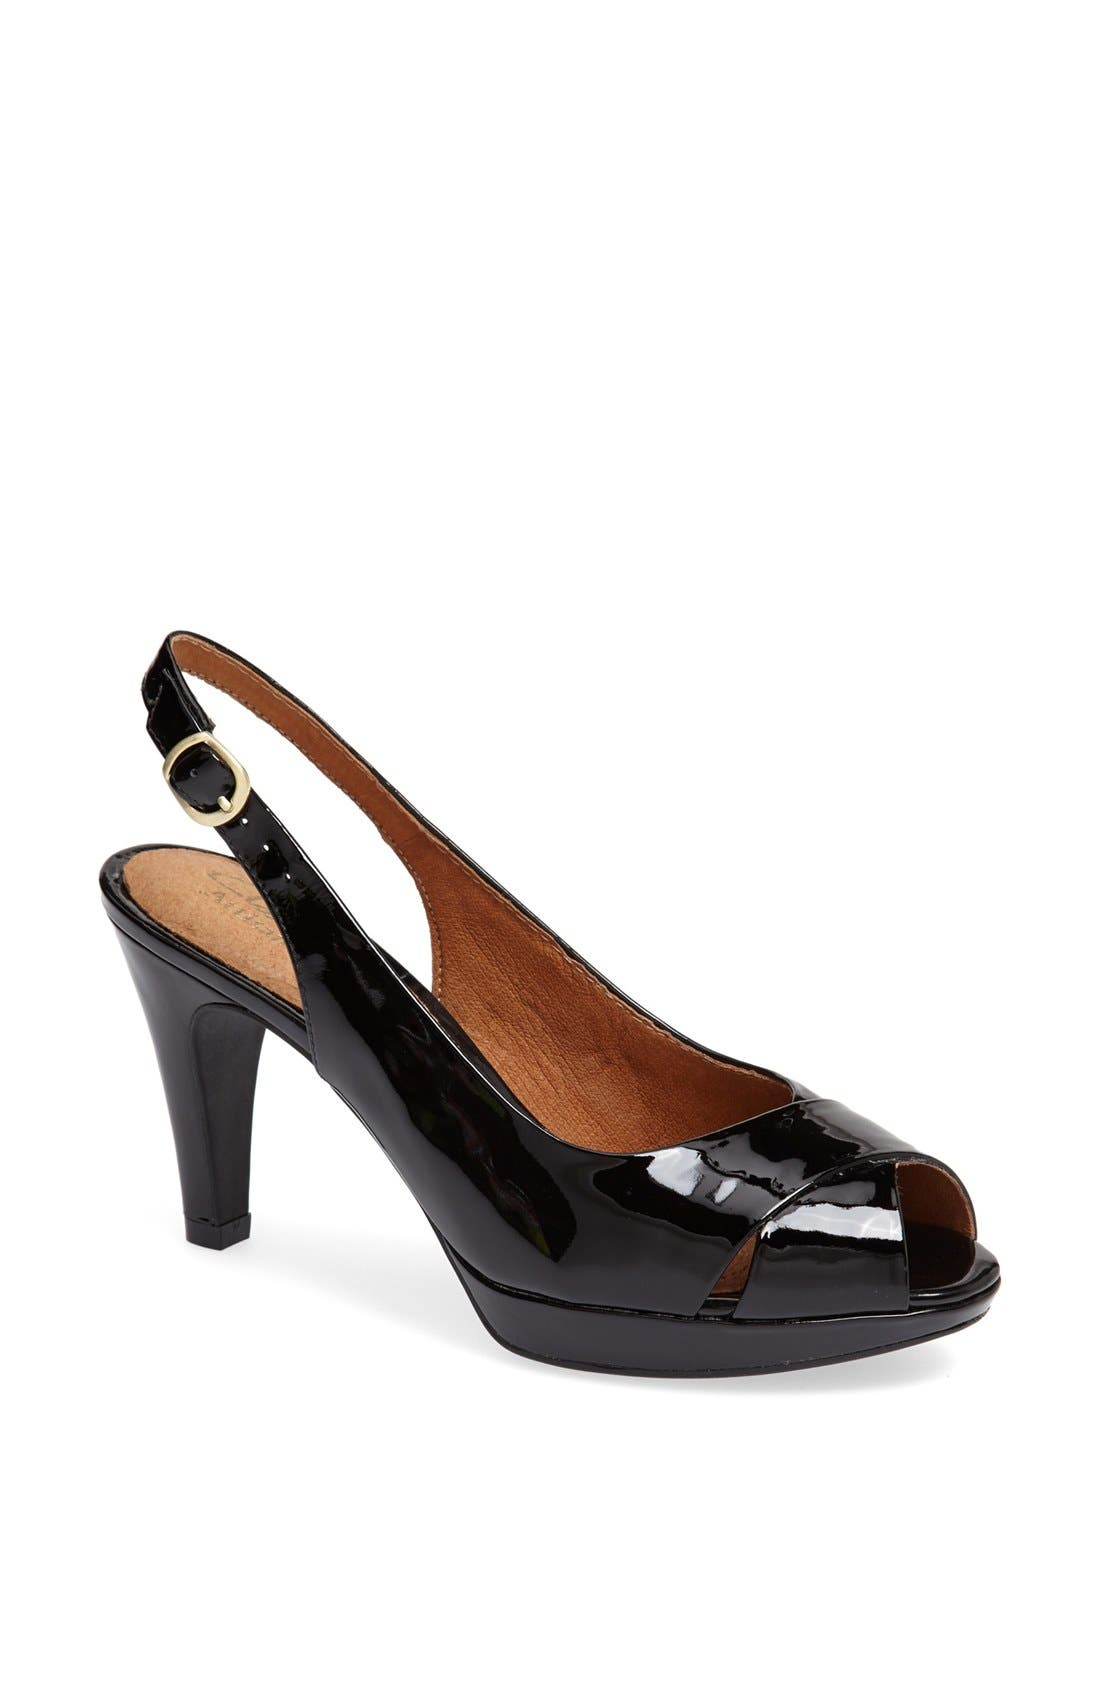 Alternate Image 1 Selected - Clarks® 'Wessex Bria' Sandal